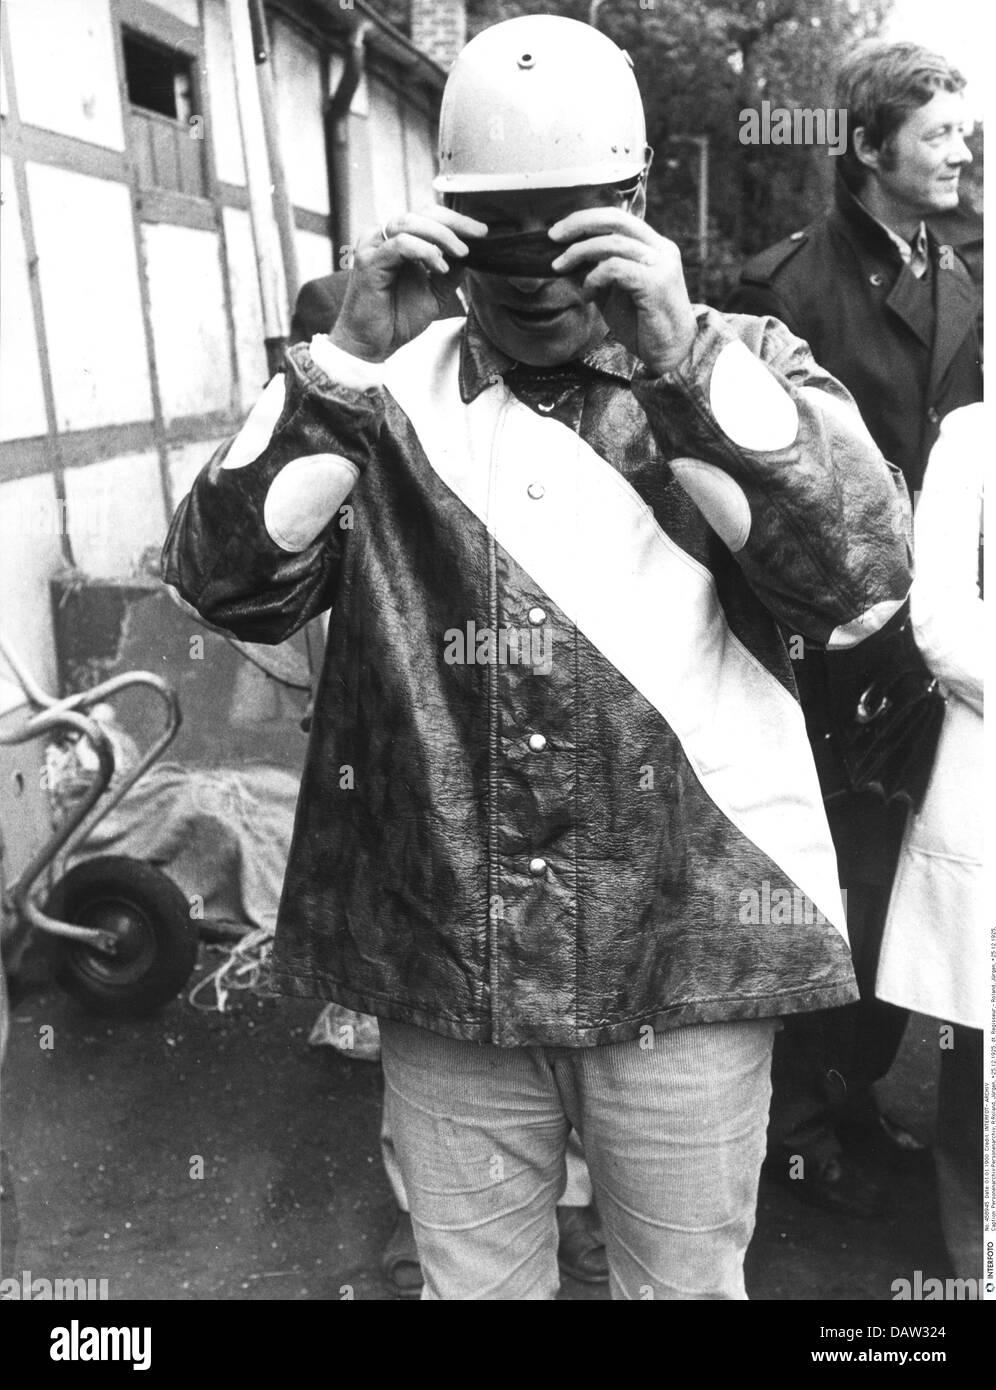 Roland, Juergen, 25.12.1925 - 21.9.2007, German director, half length, celebrity trotting race, Hamburg, 1972, 1970s, - Stock Image